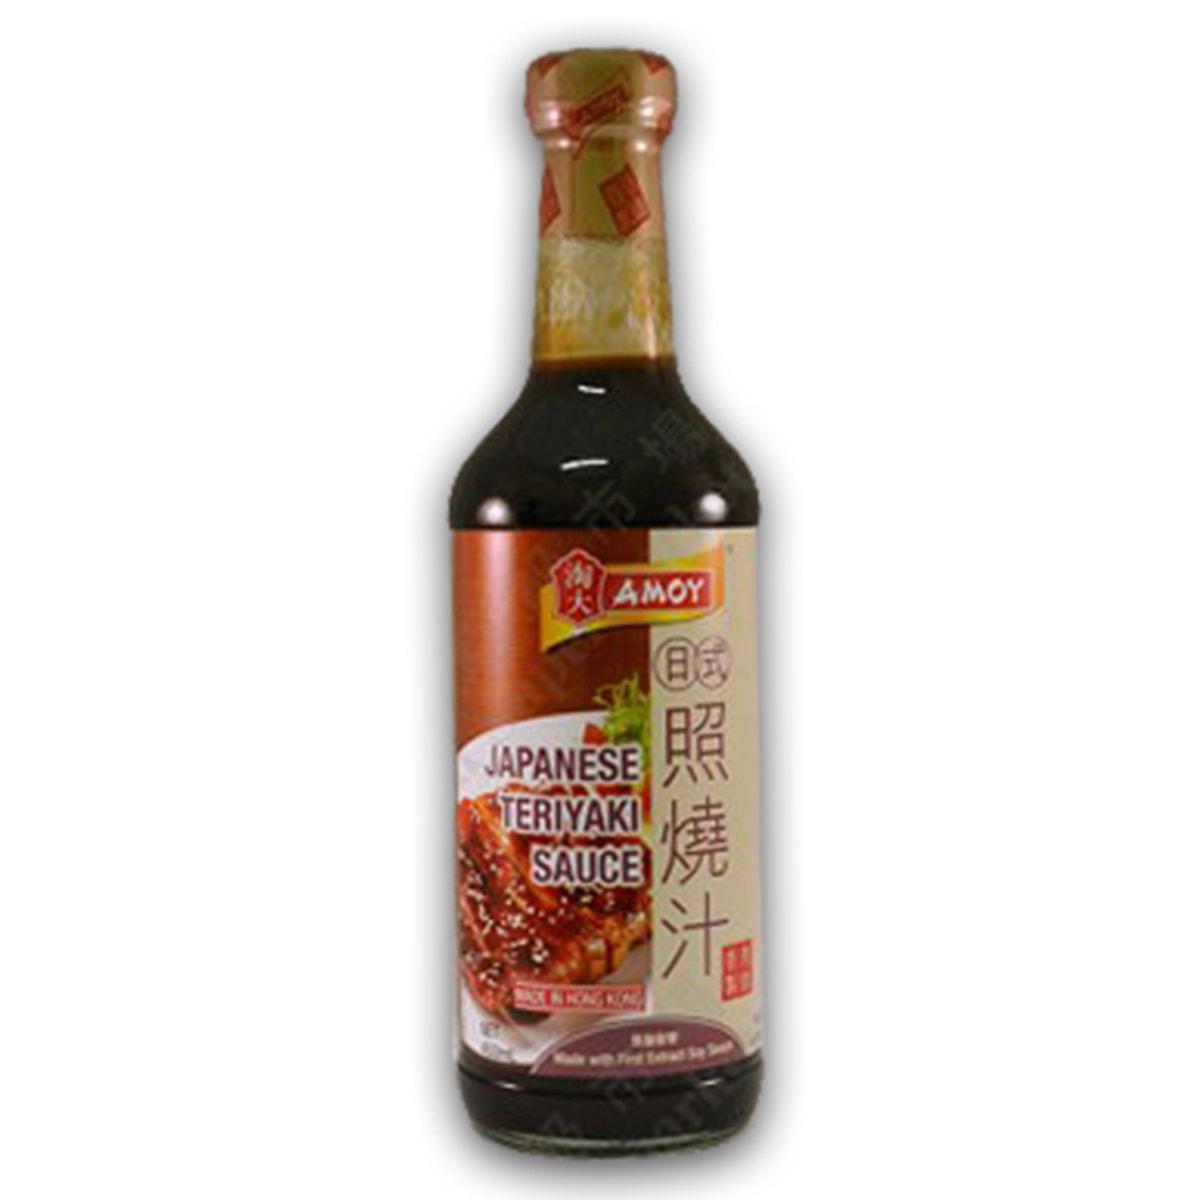 Buy Amoy Japanese Teriyaki Sauce - 450 ml